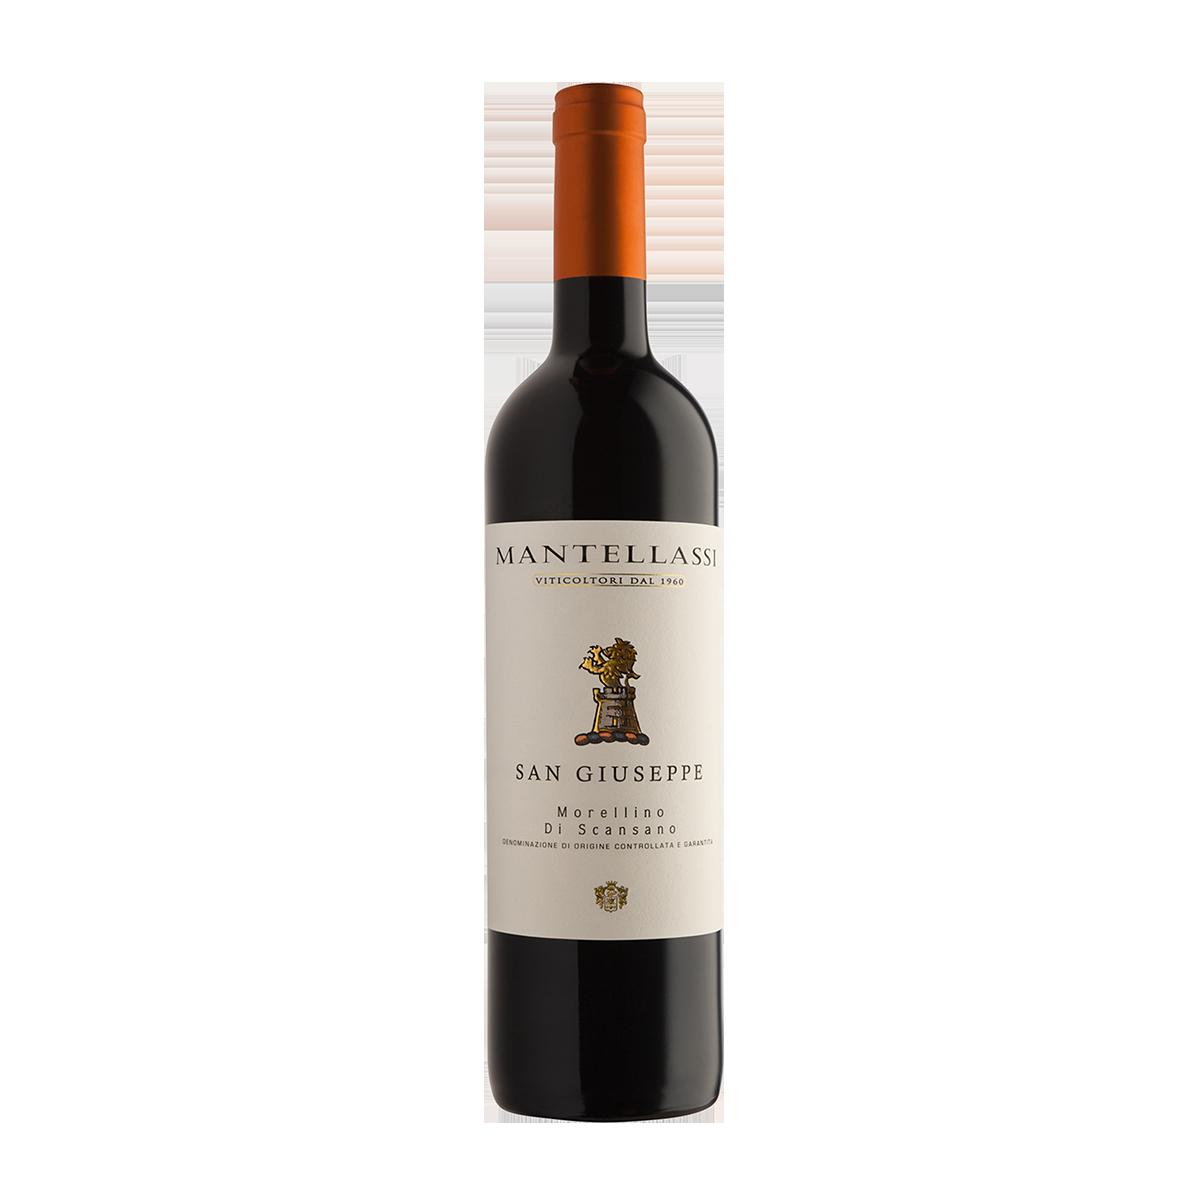 ITTM1103 義大利馬得利聖朱塞佩紅酒 Mantellassi San Giuseppe Morellino di Scansano D.O.C.G.